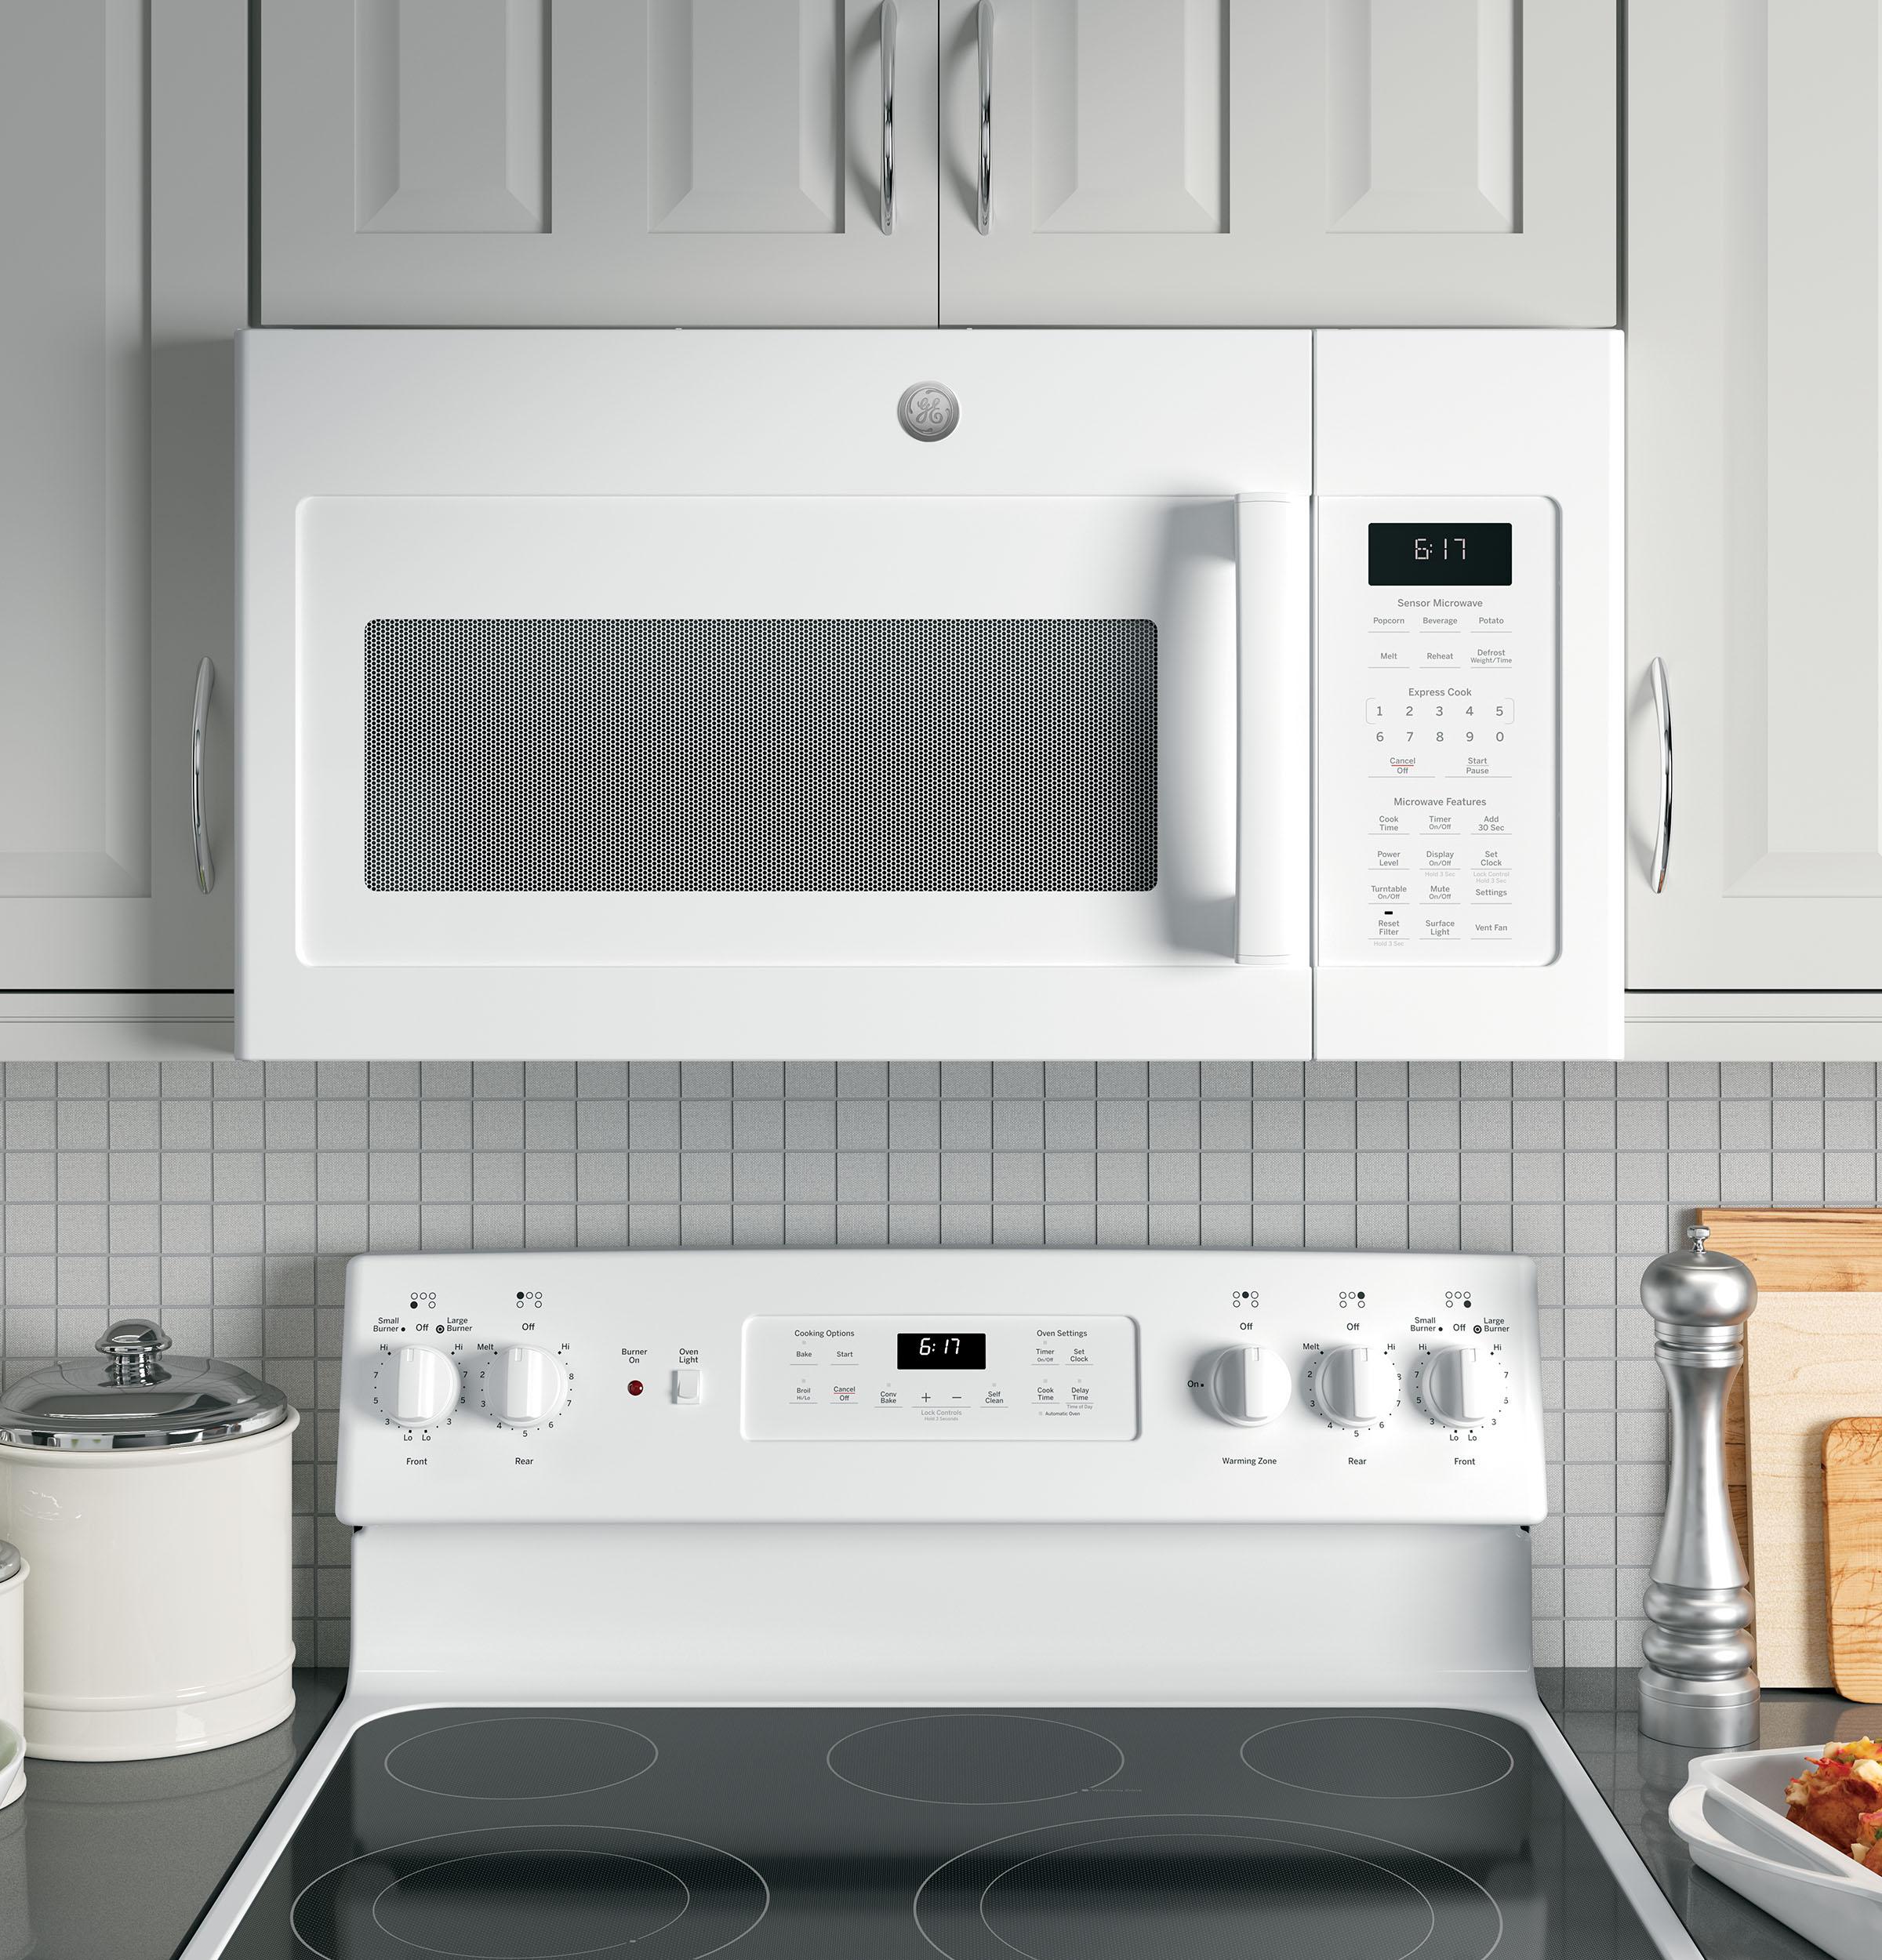 Model: JVM6175DKWW   GE GE® 1.7 Cu. Ft. Over-the-Range Sensor Microwave Oven